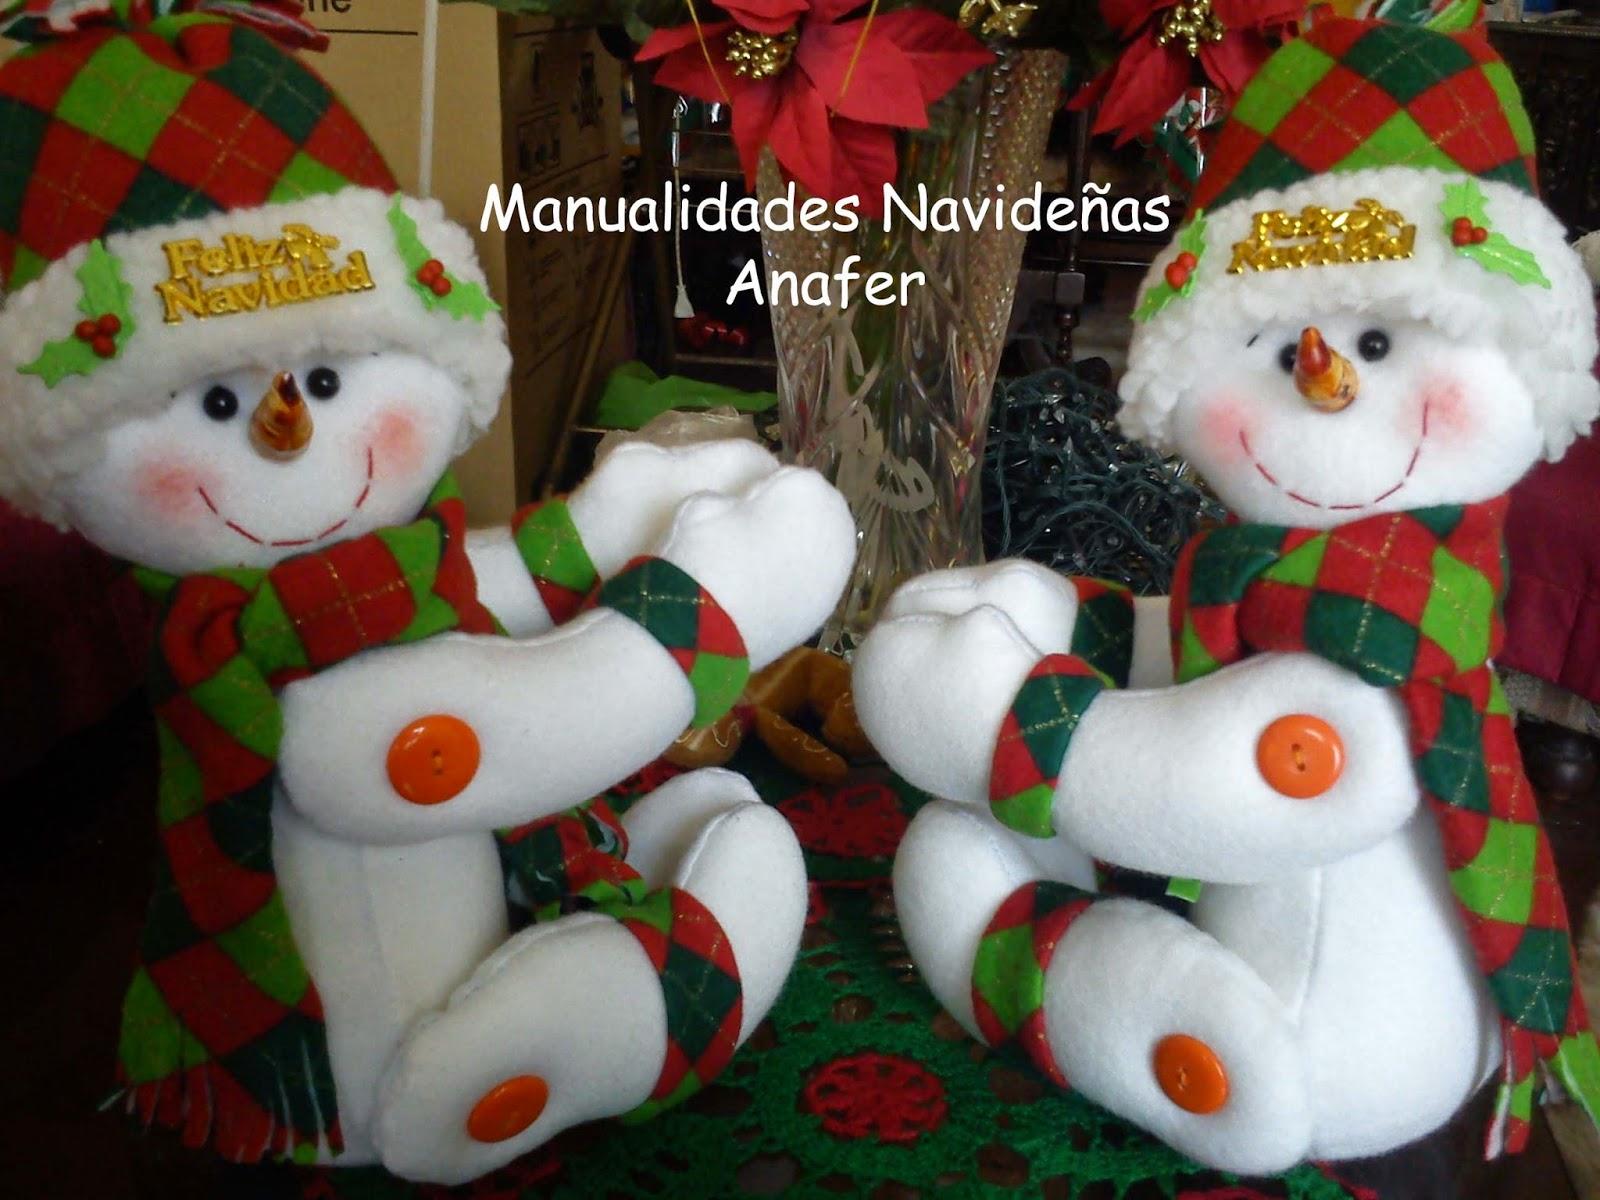 Manualidades anafer mu ecos cortineros - Manualidades munecos de navidad ...